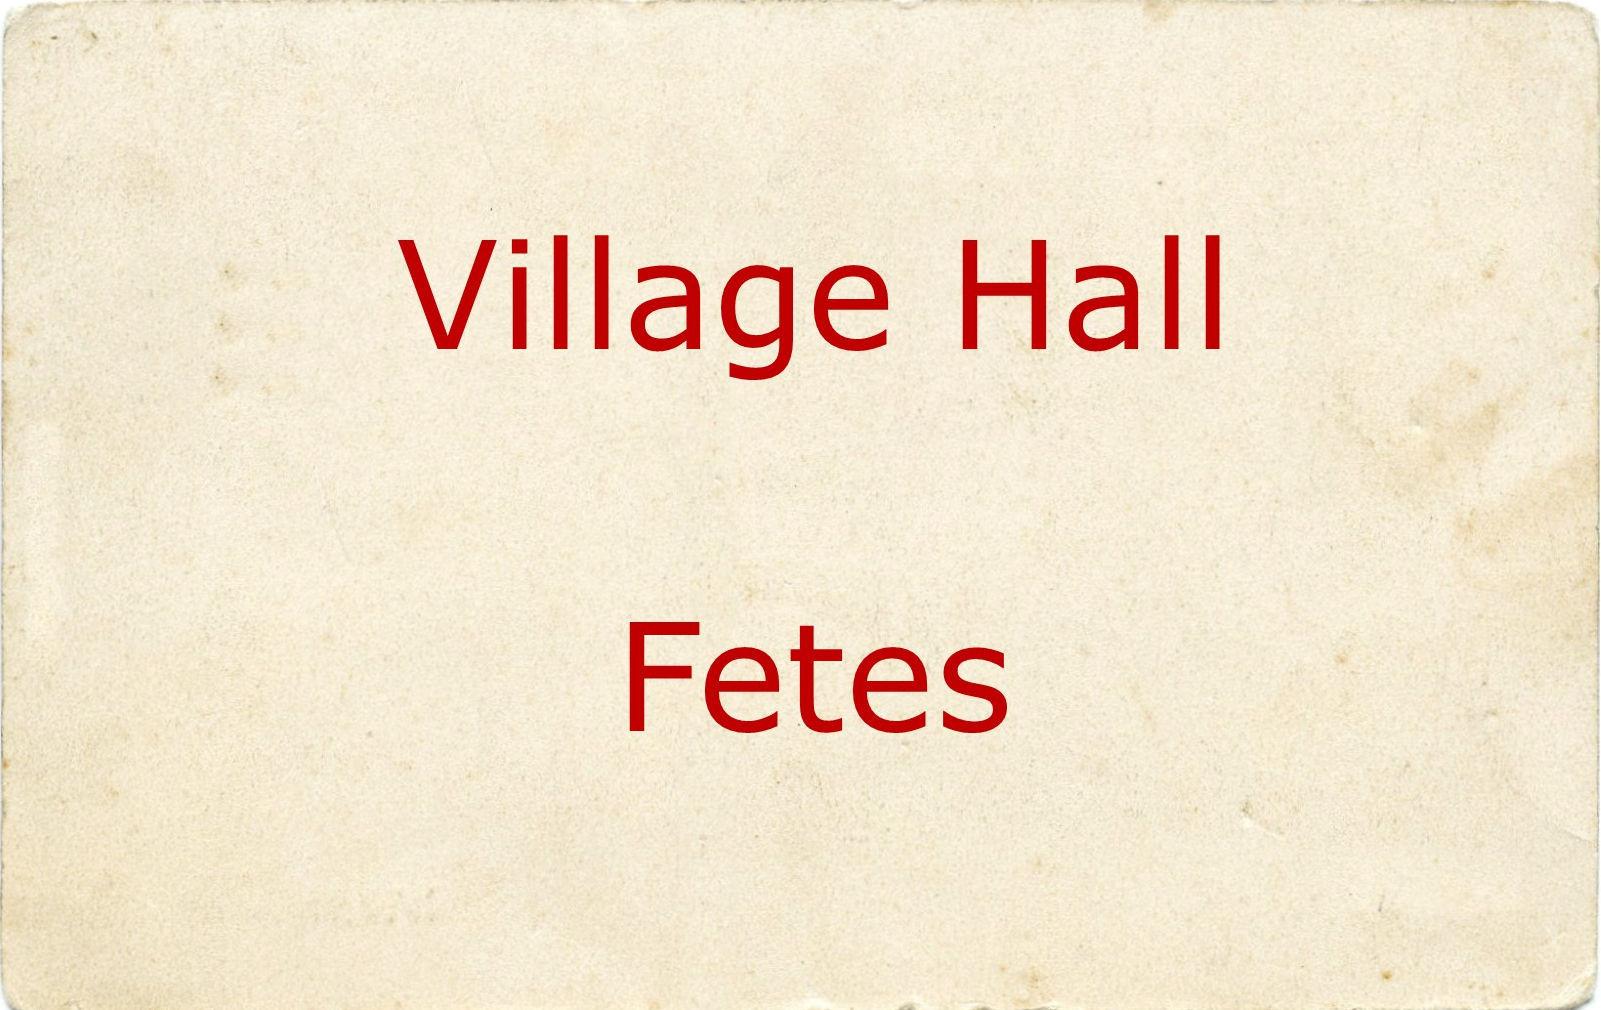 Village Hall Fetes